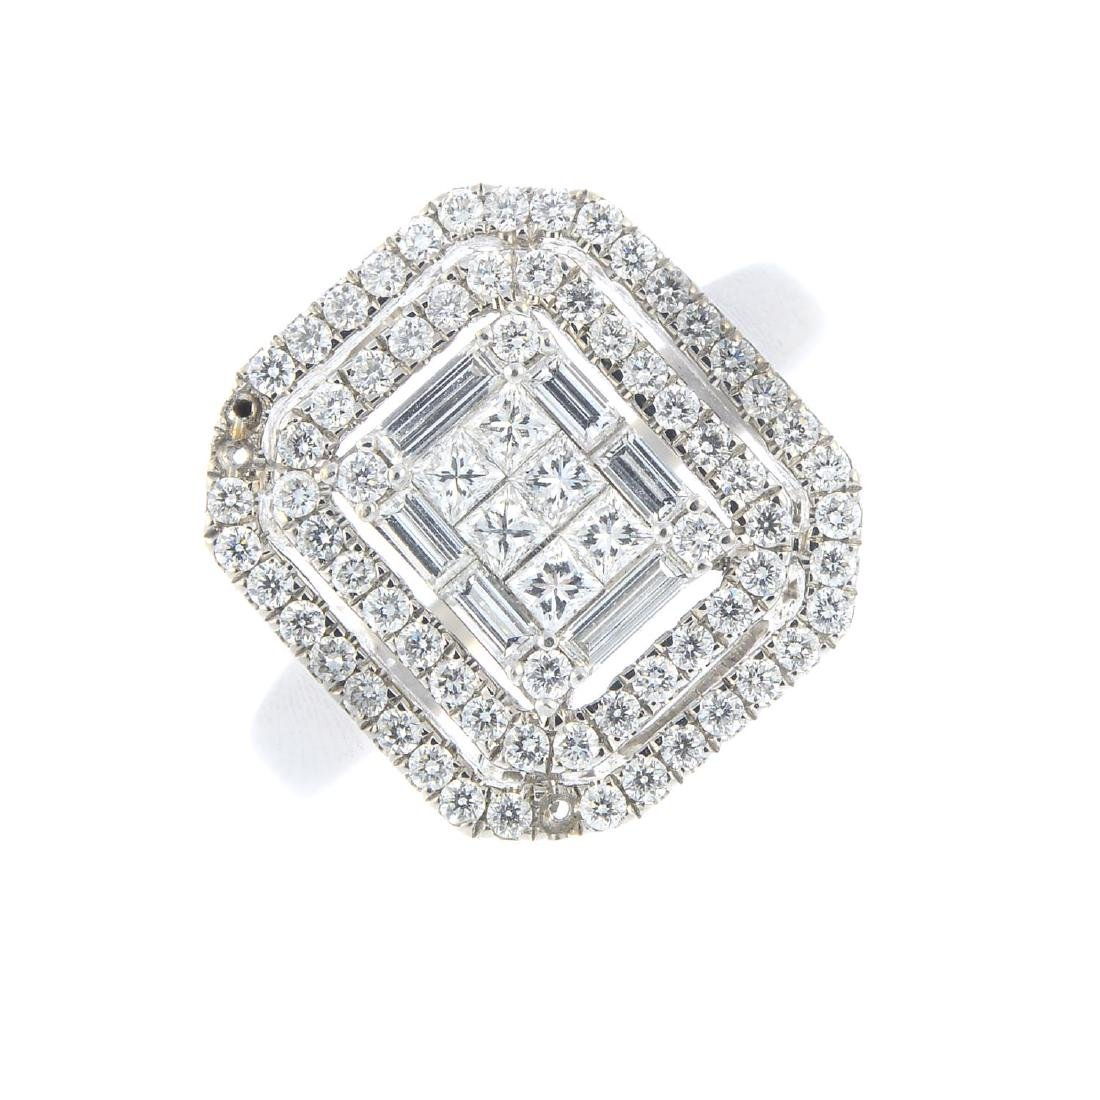 An 18ct gold diamond dress ring. Designed as a vari-cut